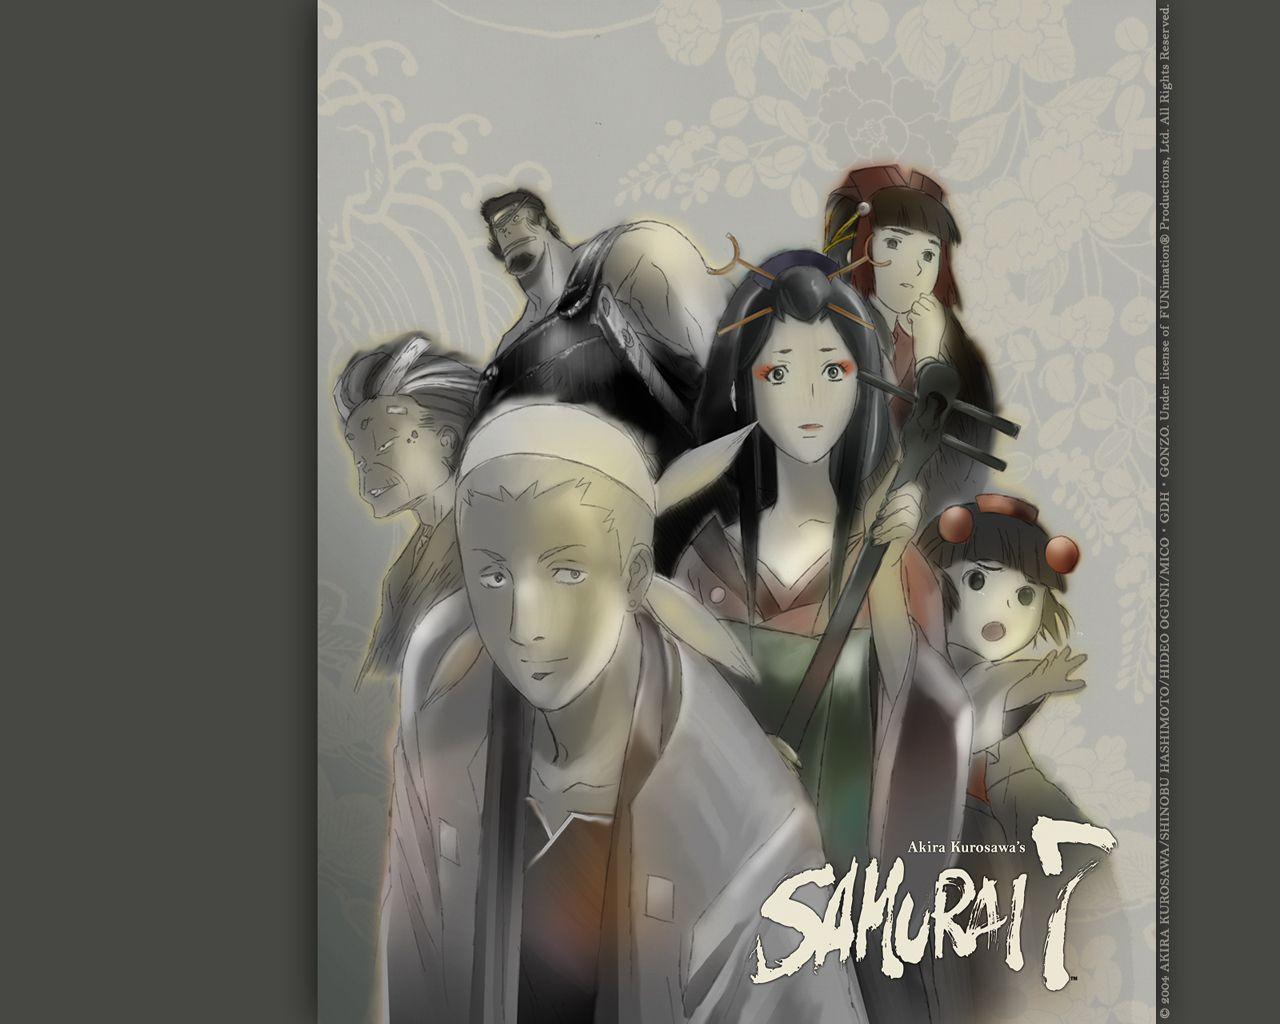 Samurai 7 Anime Characters : Samurai 7 wallpaper #185210 zerochan anime image board